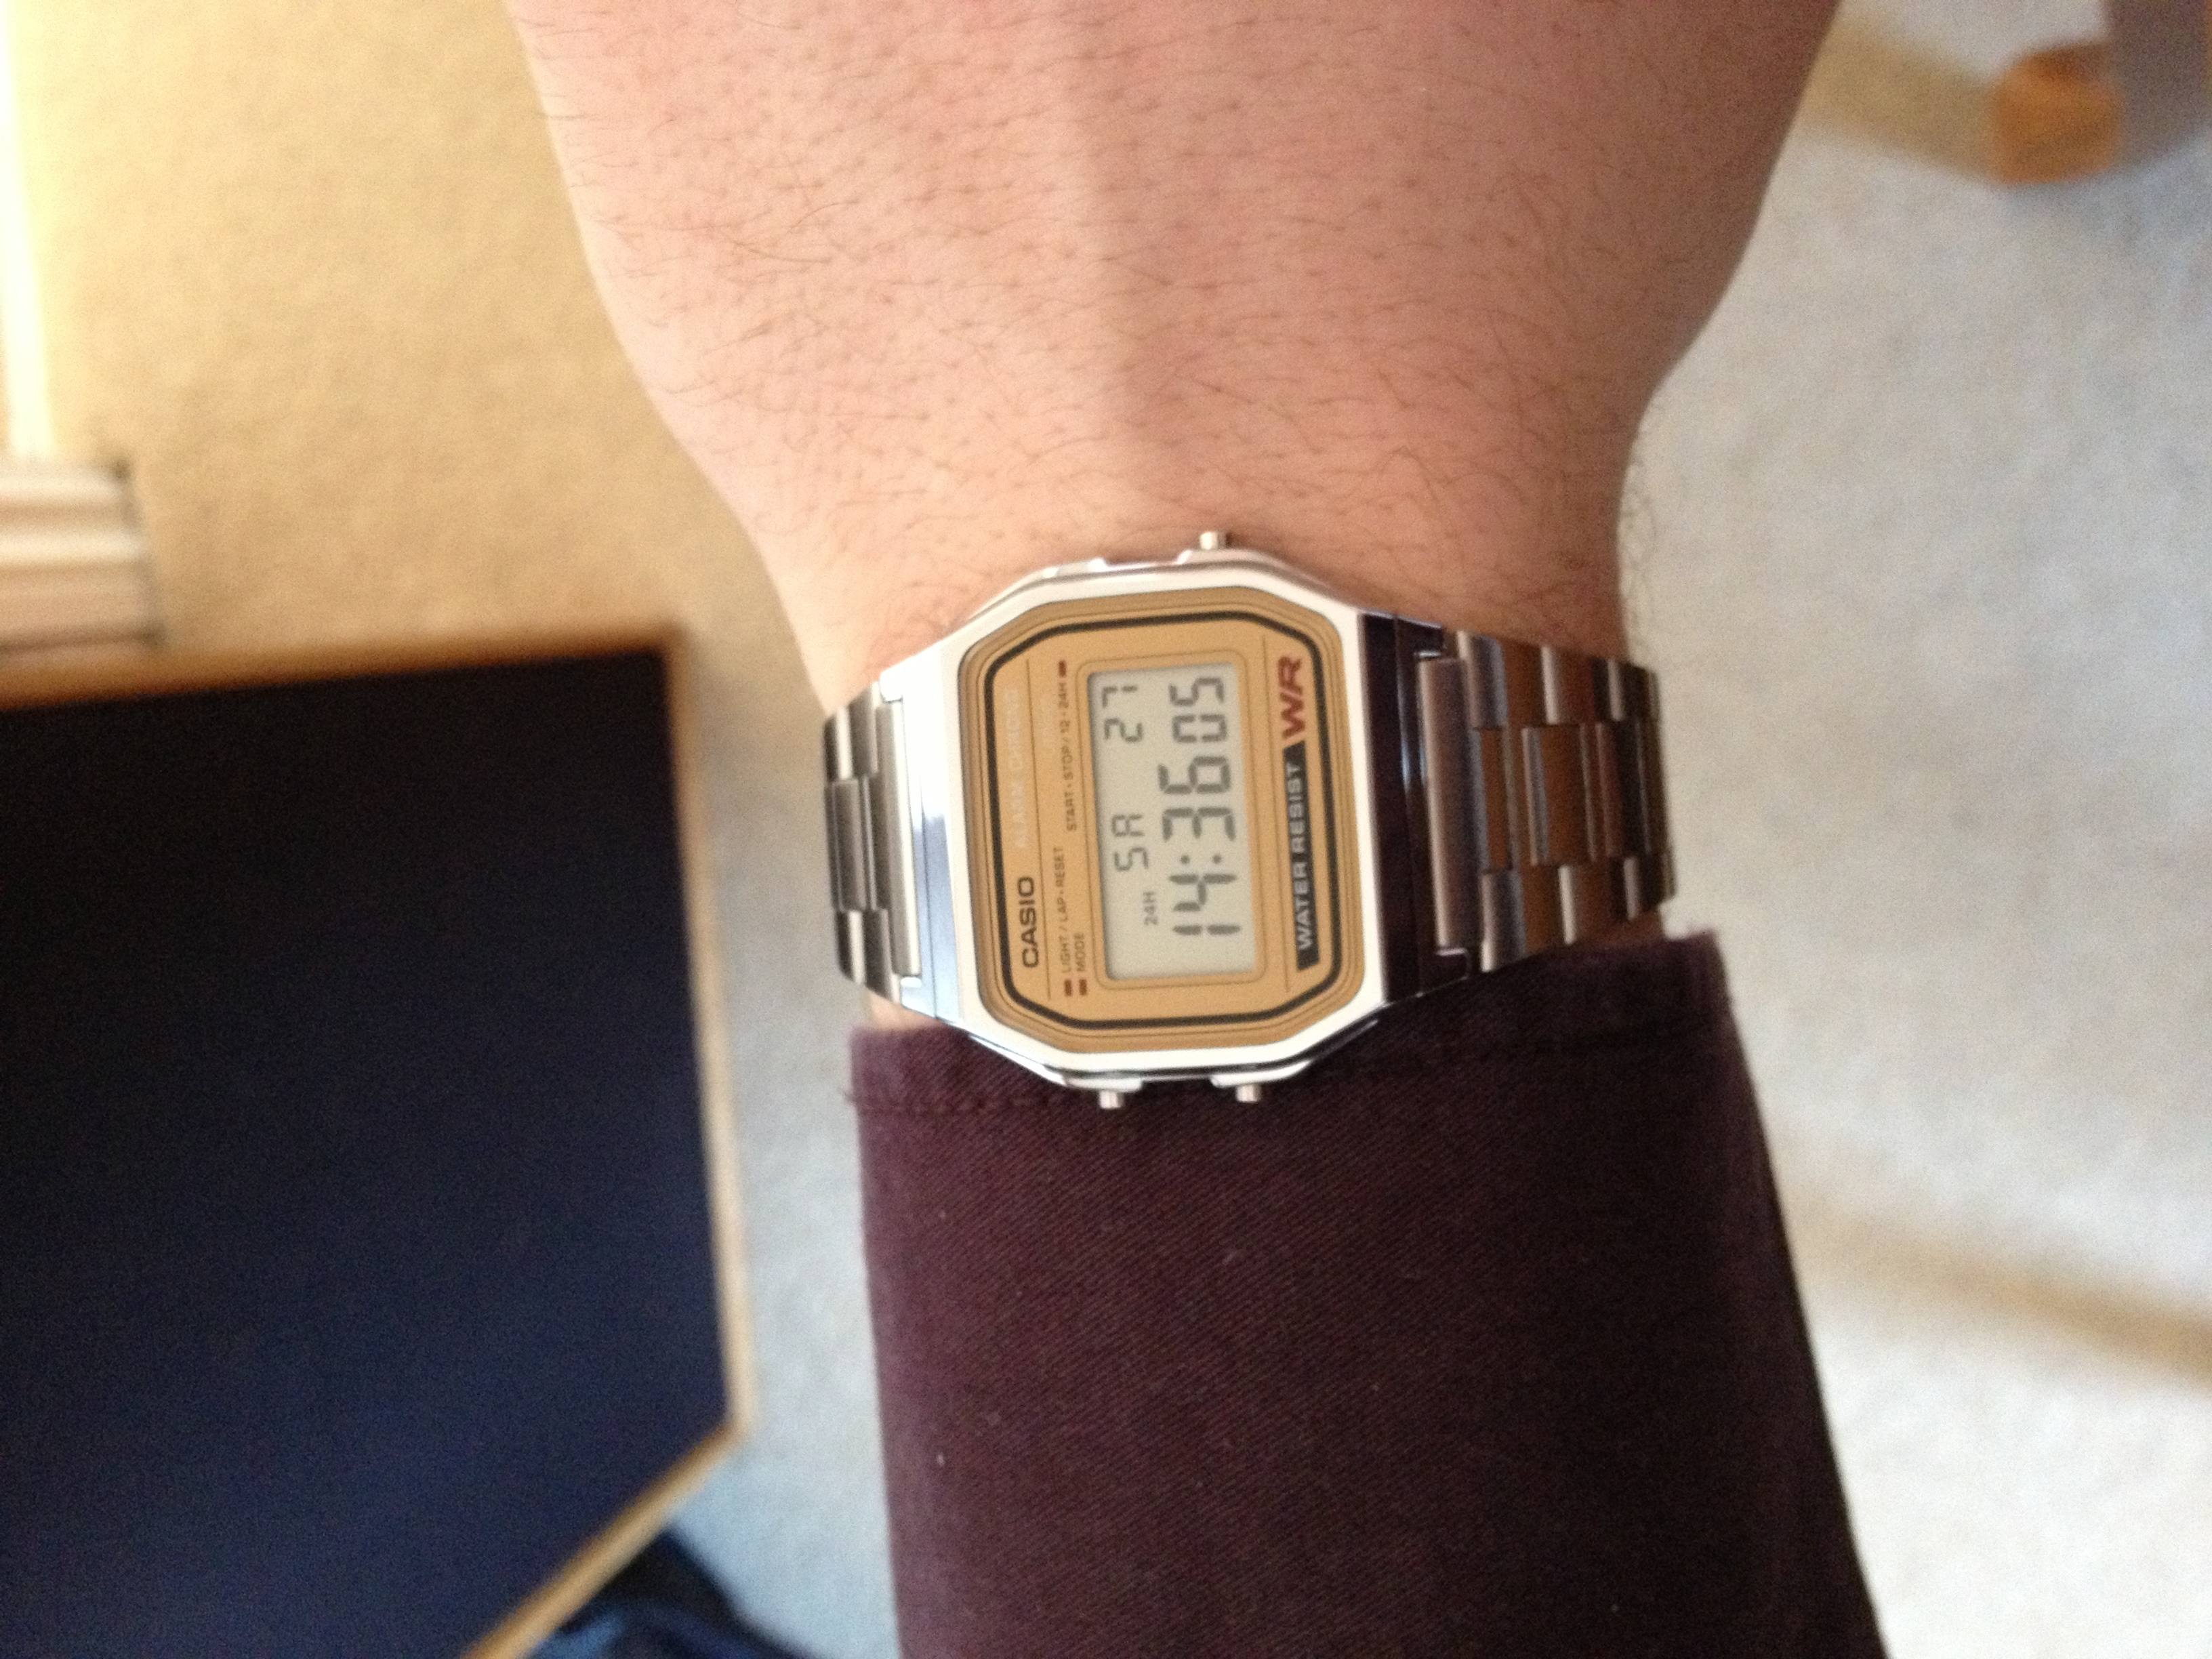 e90a307b890 Unisex Casio Classic Alarm Chronograph Watch (A158WEA-9EF ...